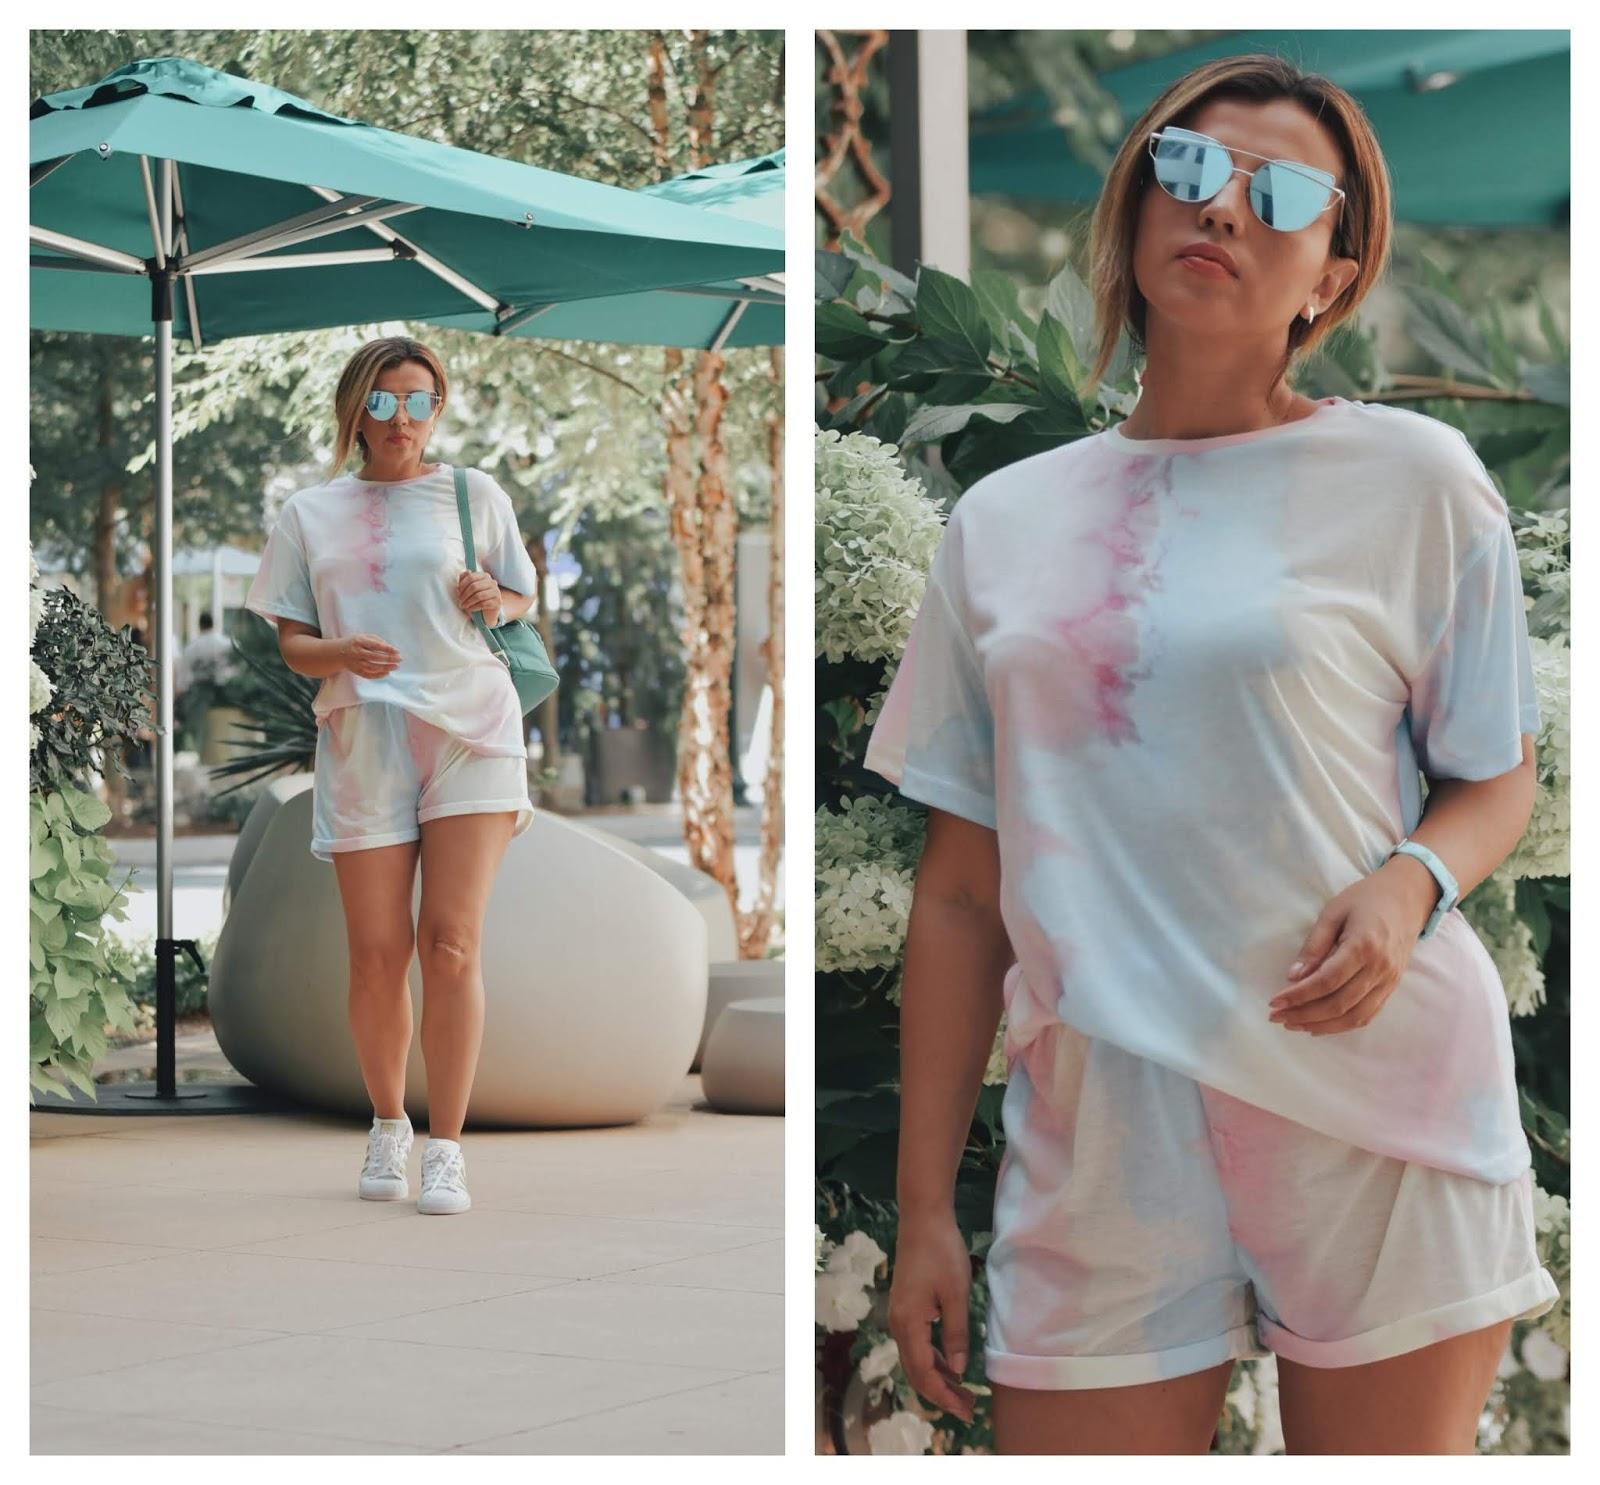 Tie Dye Tee- Shorts Set-mariestilo-sheingals-streetwear-fashionblogger-dcblogger-modaelsalvador-youtuber-